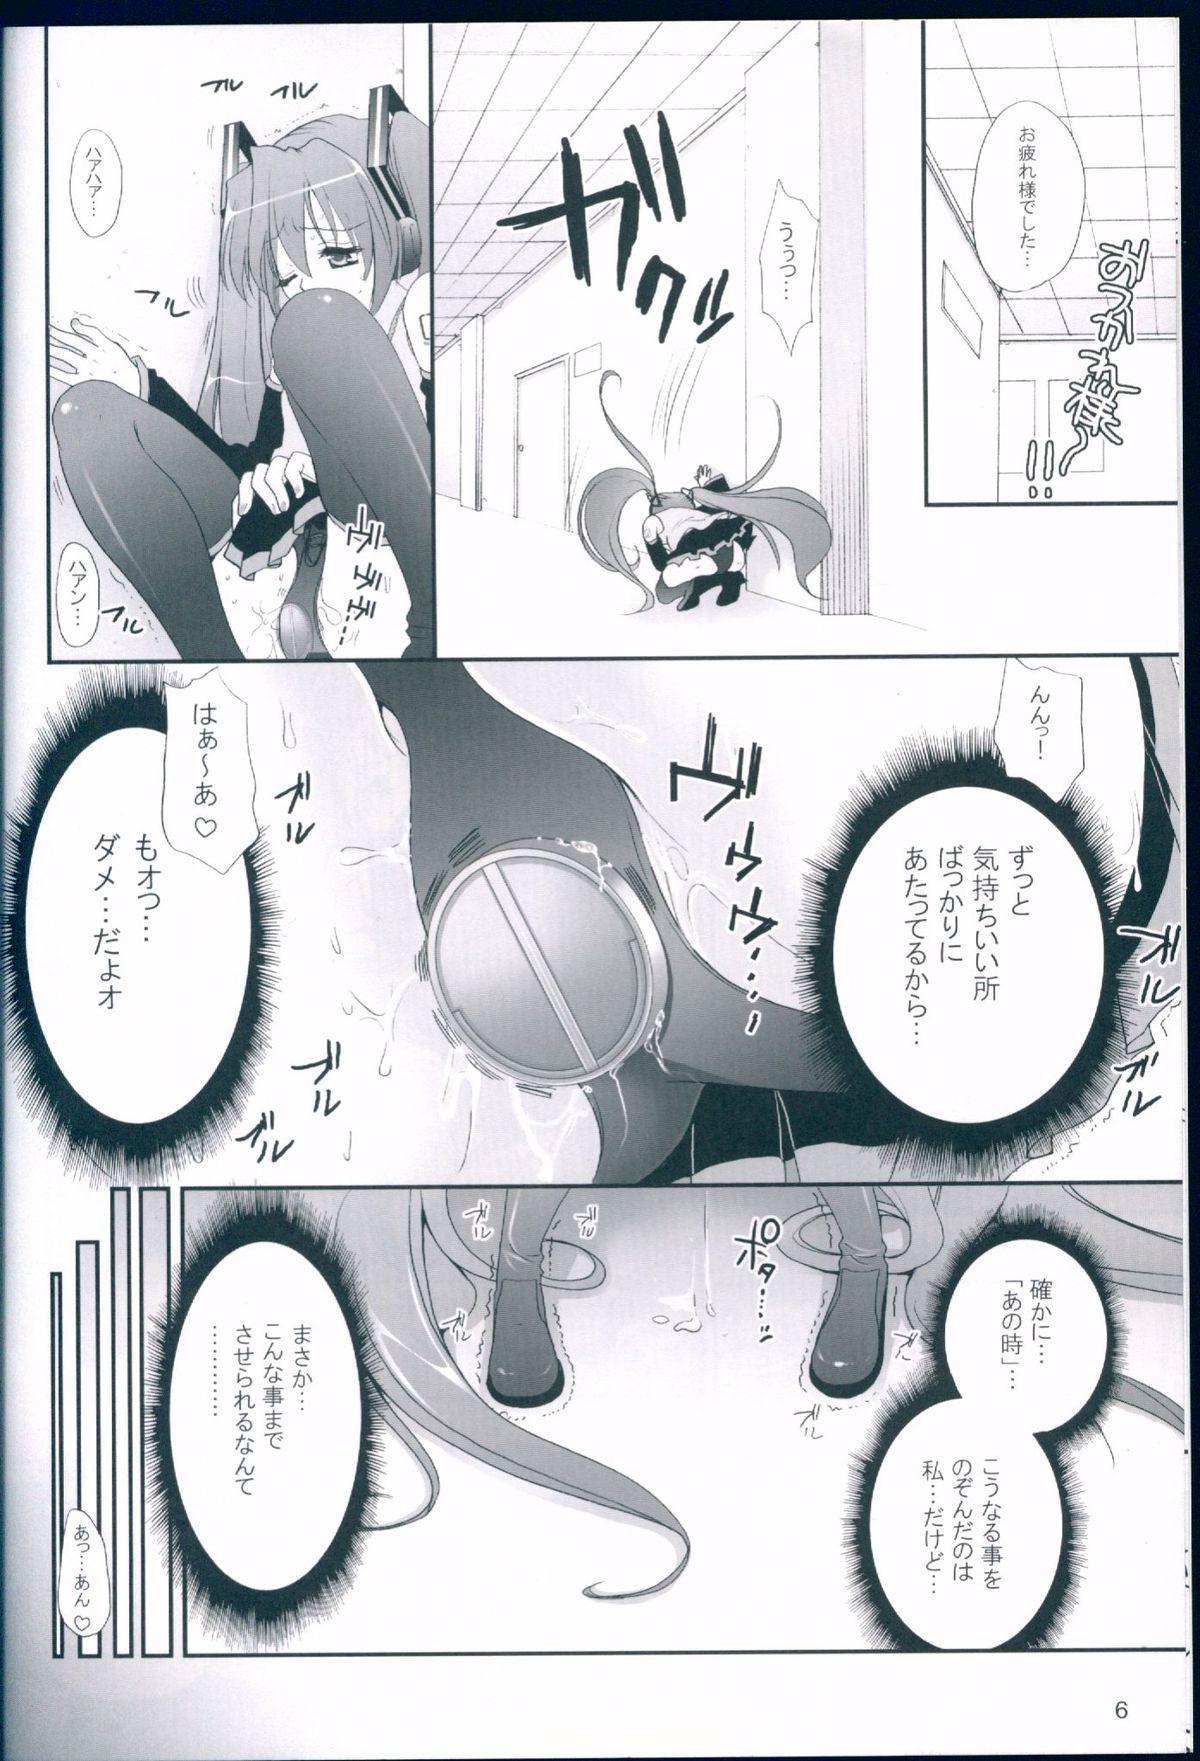 R Juu - Hatsune Miku Kenkan 5